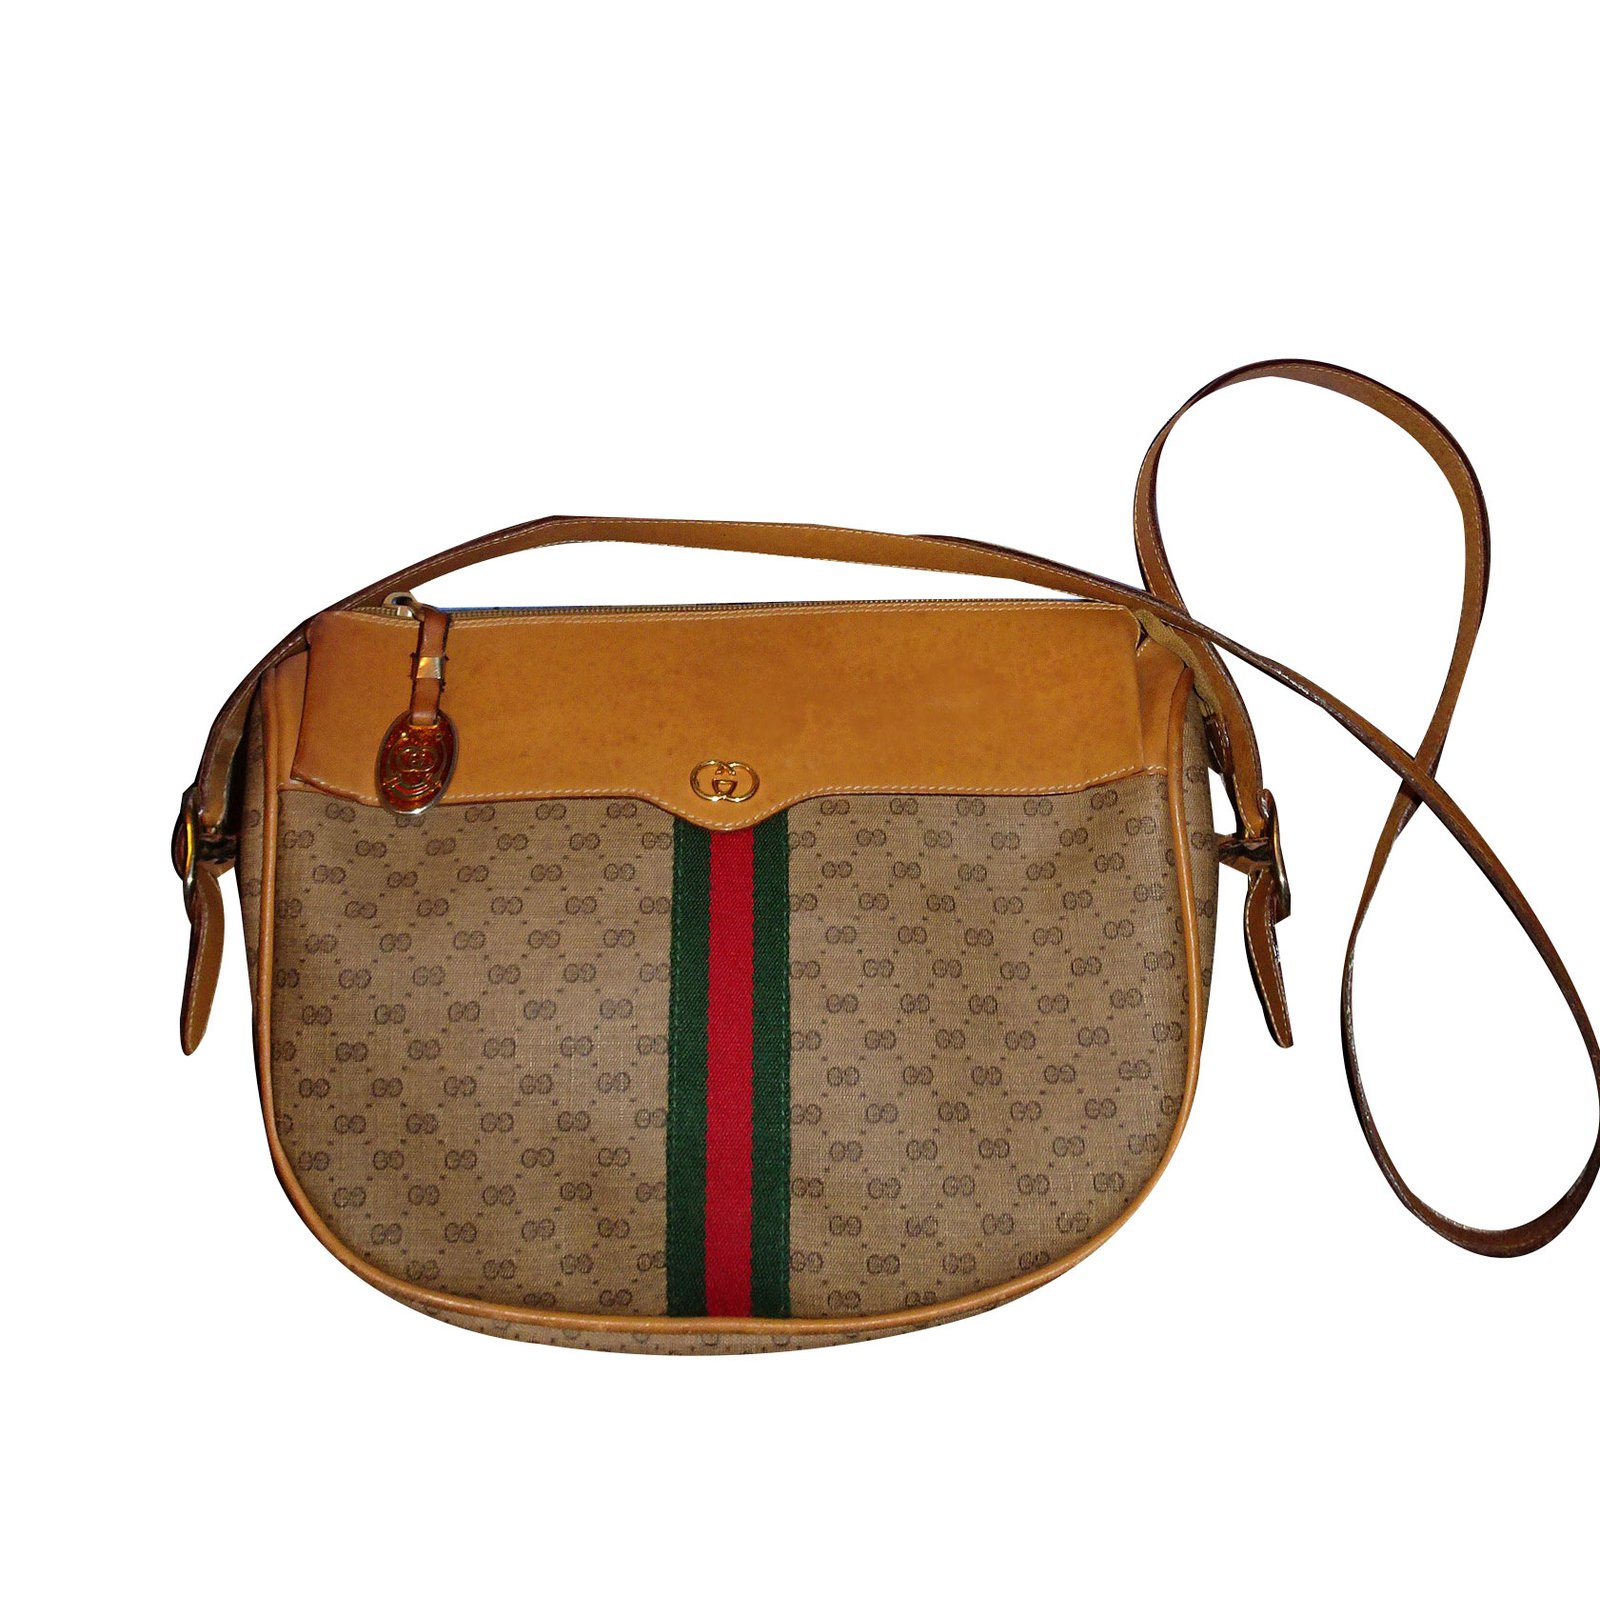 27c4d20b73ab Gucci Shoulder crossbody bag Handbags Leather Brown,Beige ref.43327 ...